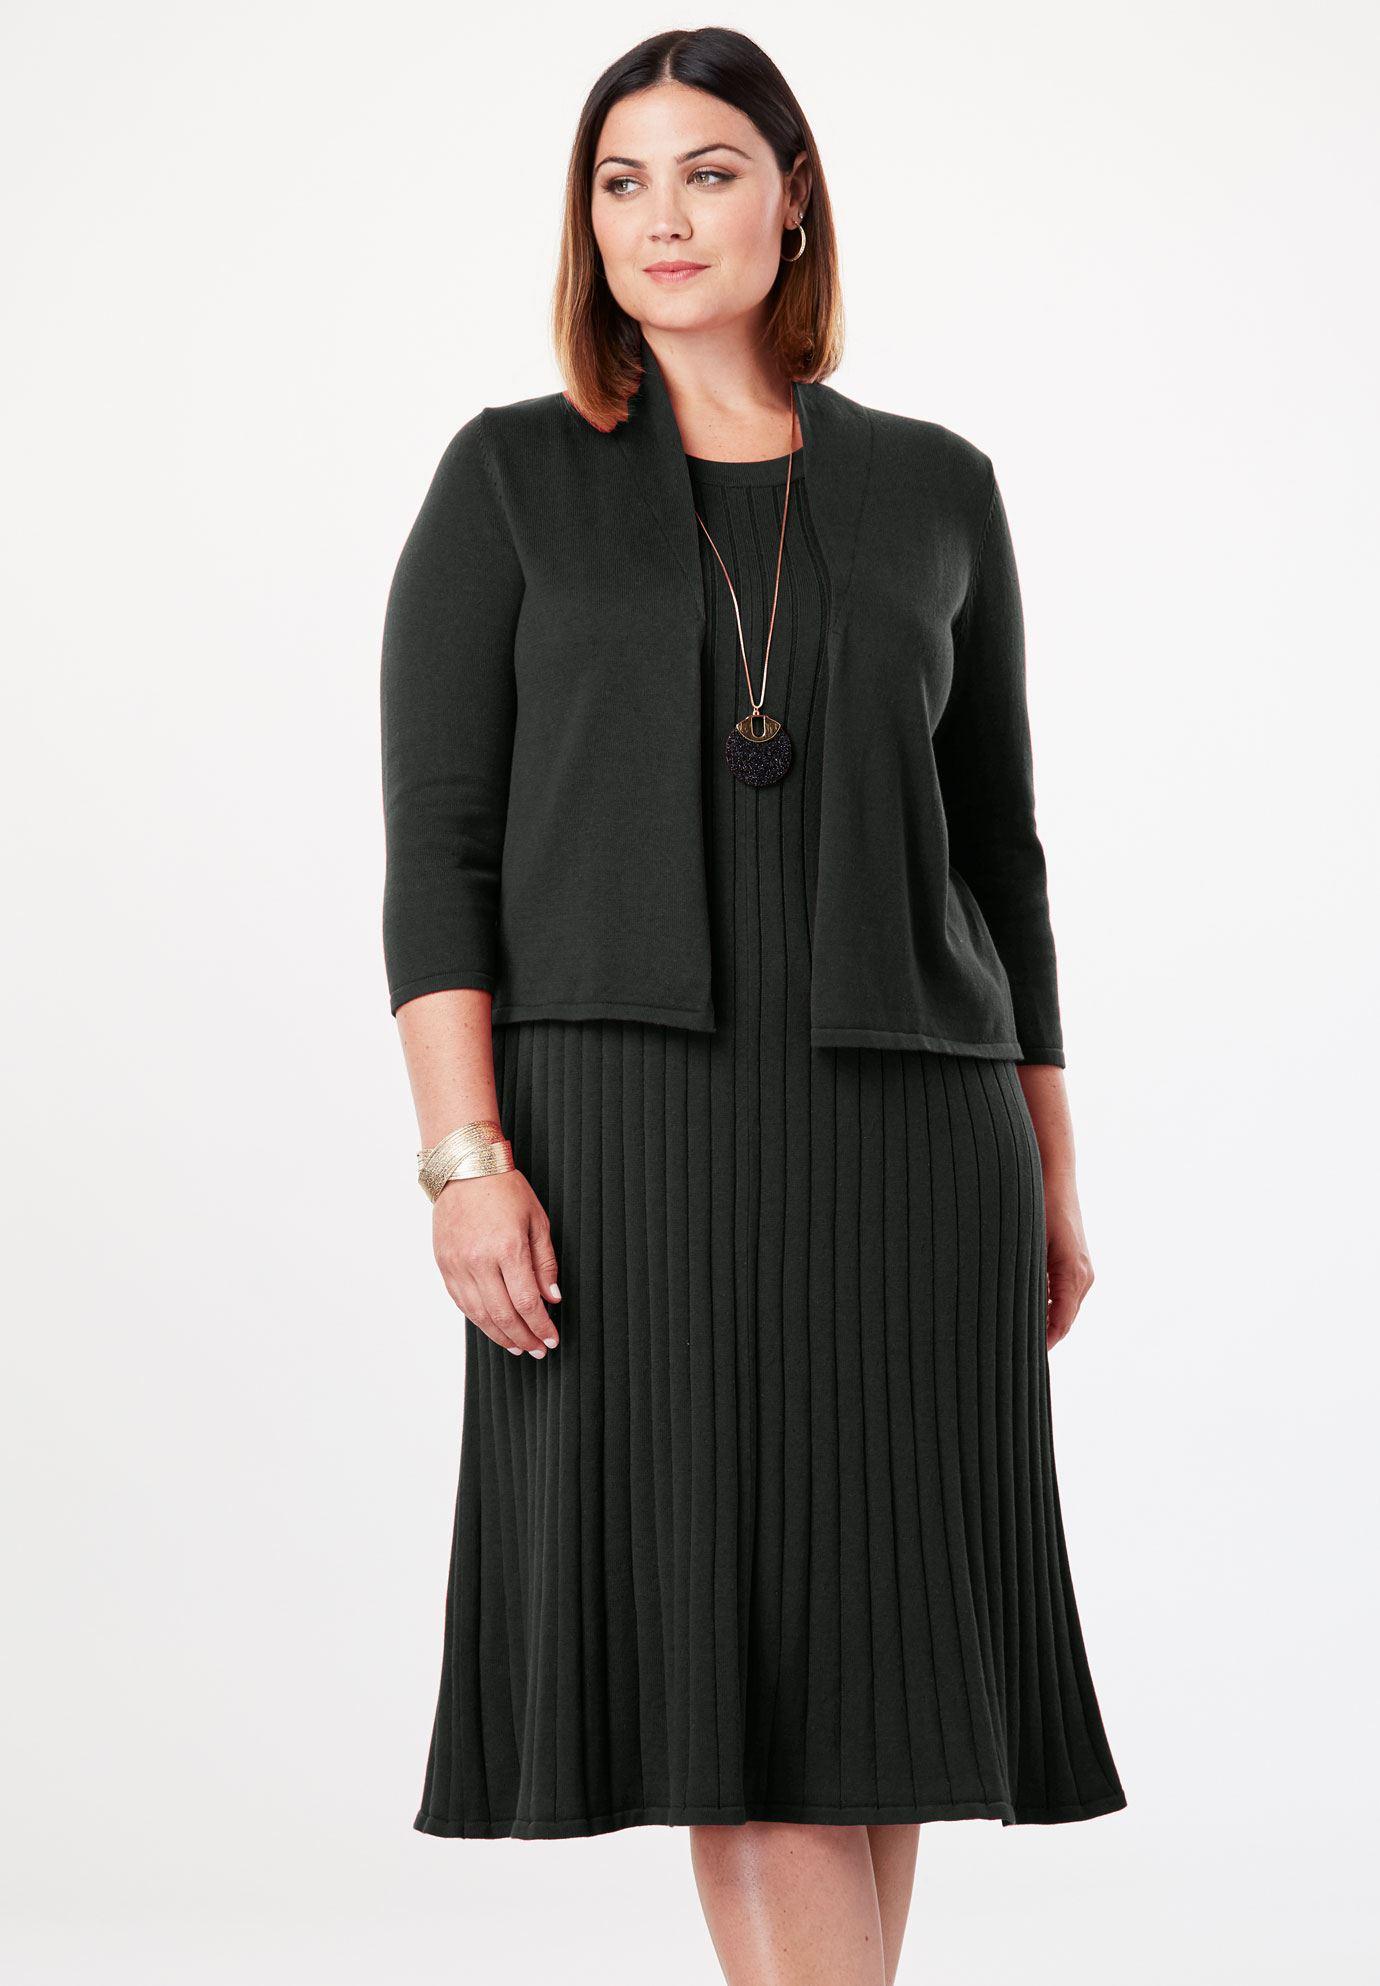 Sweater Jacket Dress | Plus Size Jacket Dresses | Jessica London